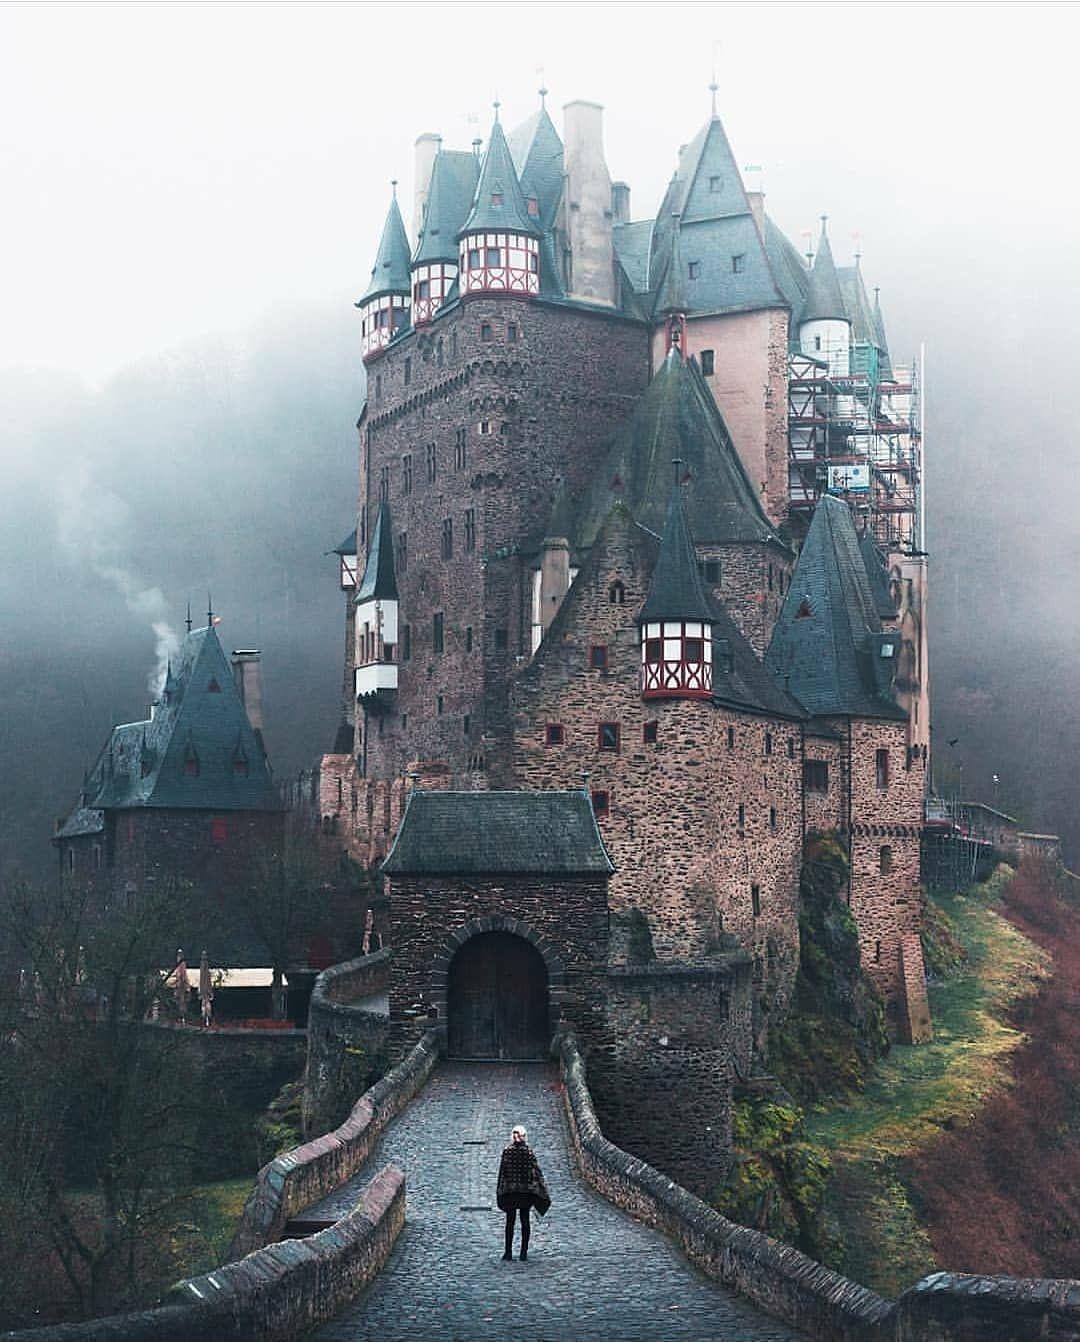 Burg Eltz Germany Jonathan Alonso Travel Places Around The World Webpage Www Thejonathanalonso Com Germany Castles Places To Travel Beautiful Castles